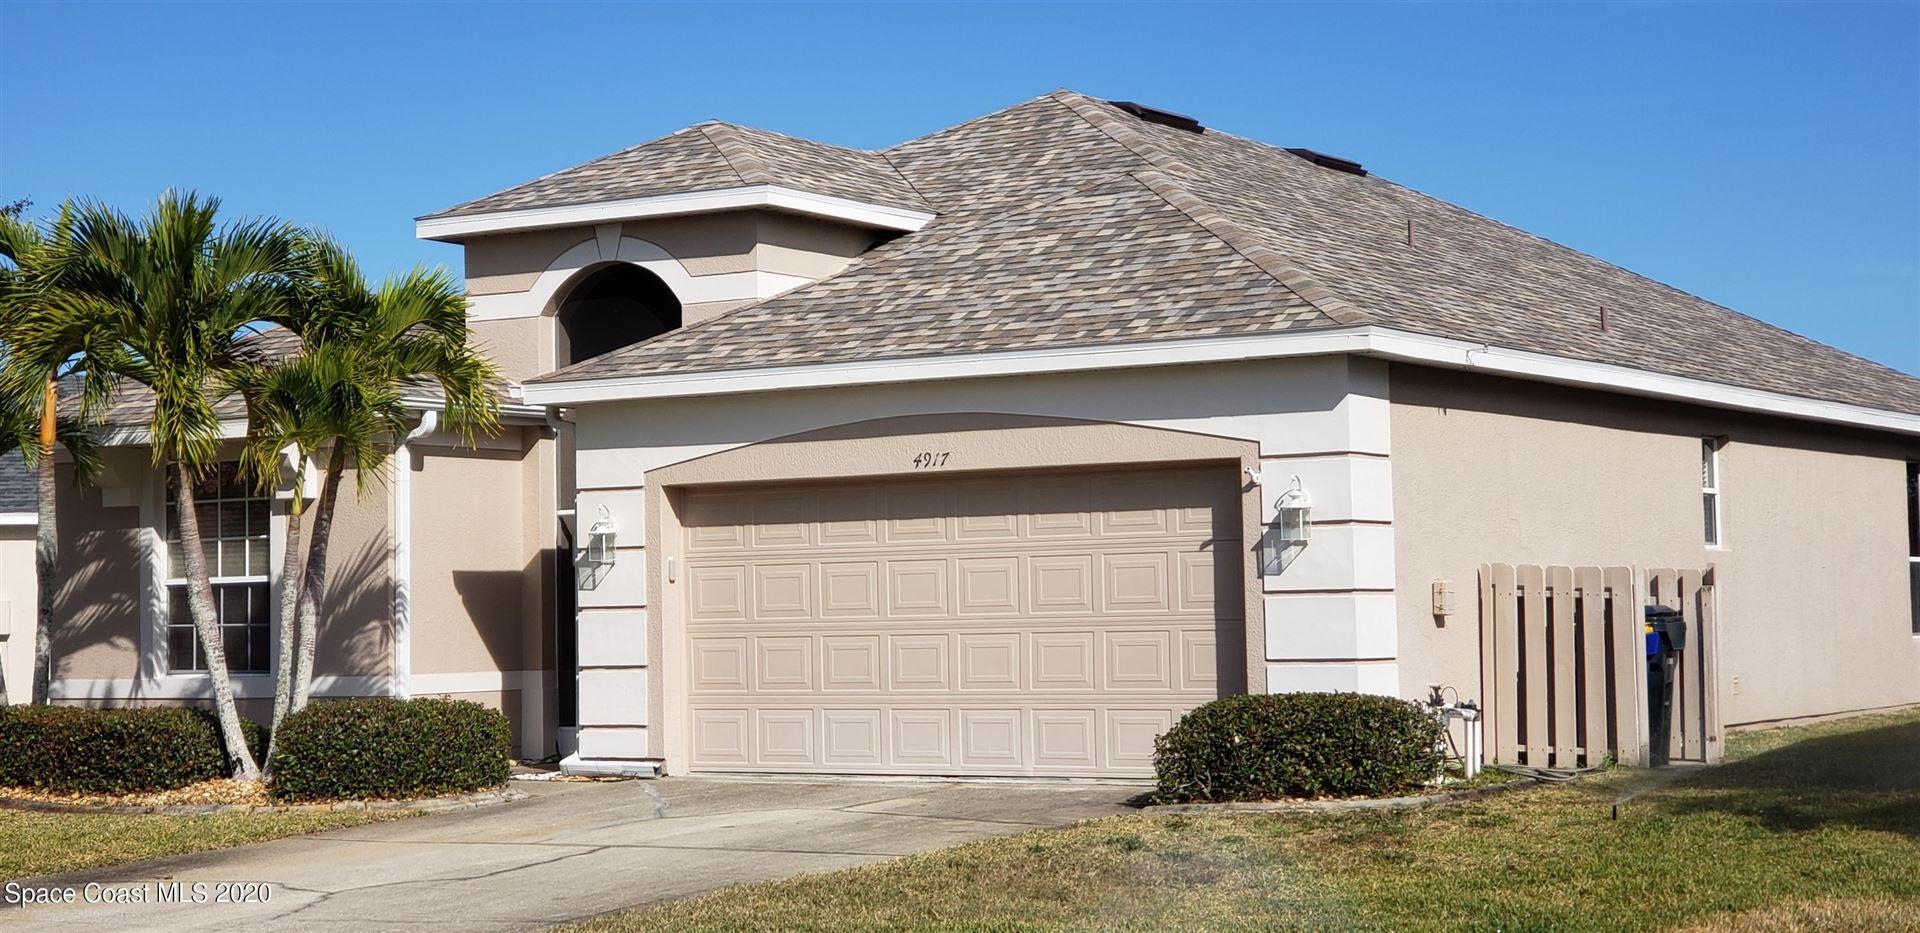 4917 Worthington Circle, Rockledge, FL 32955 - #: 894216